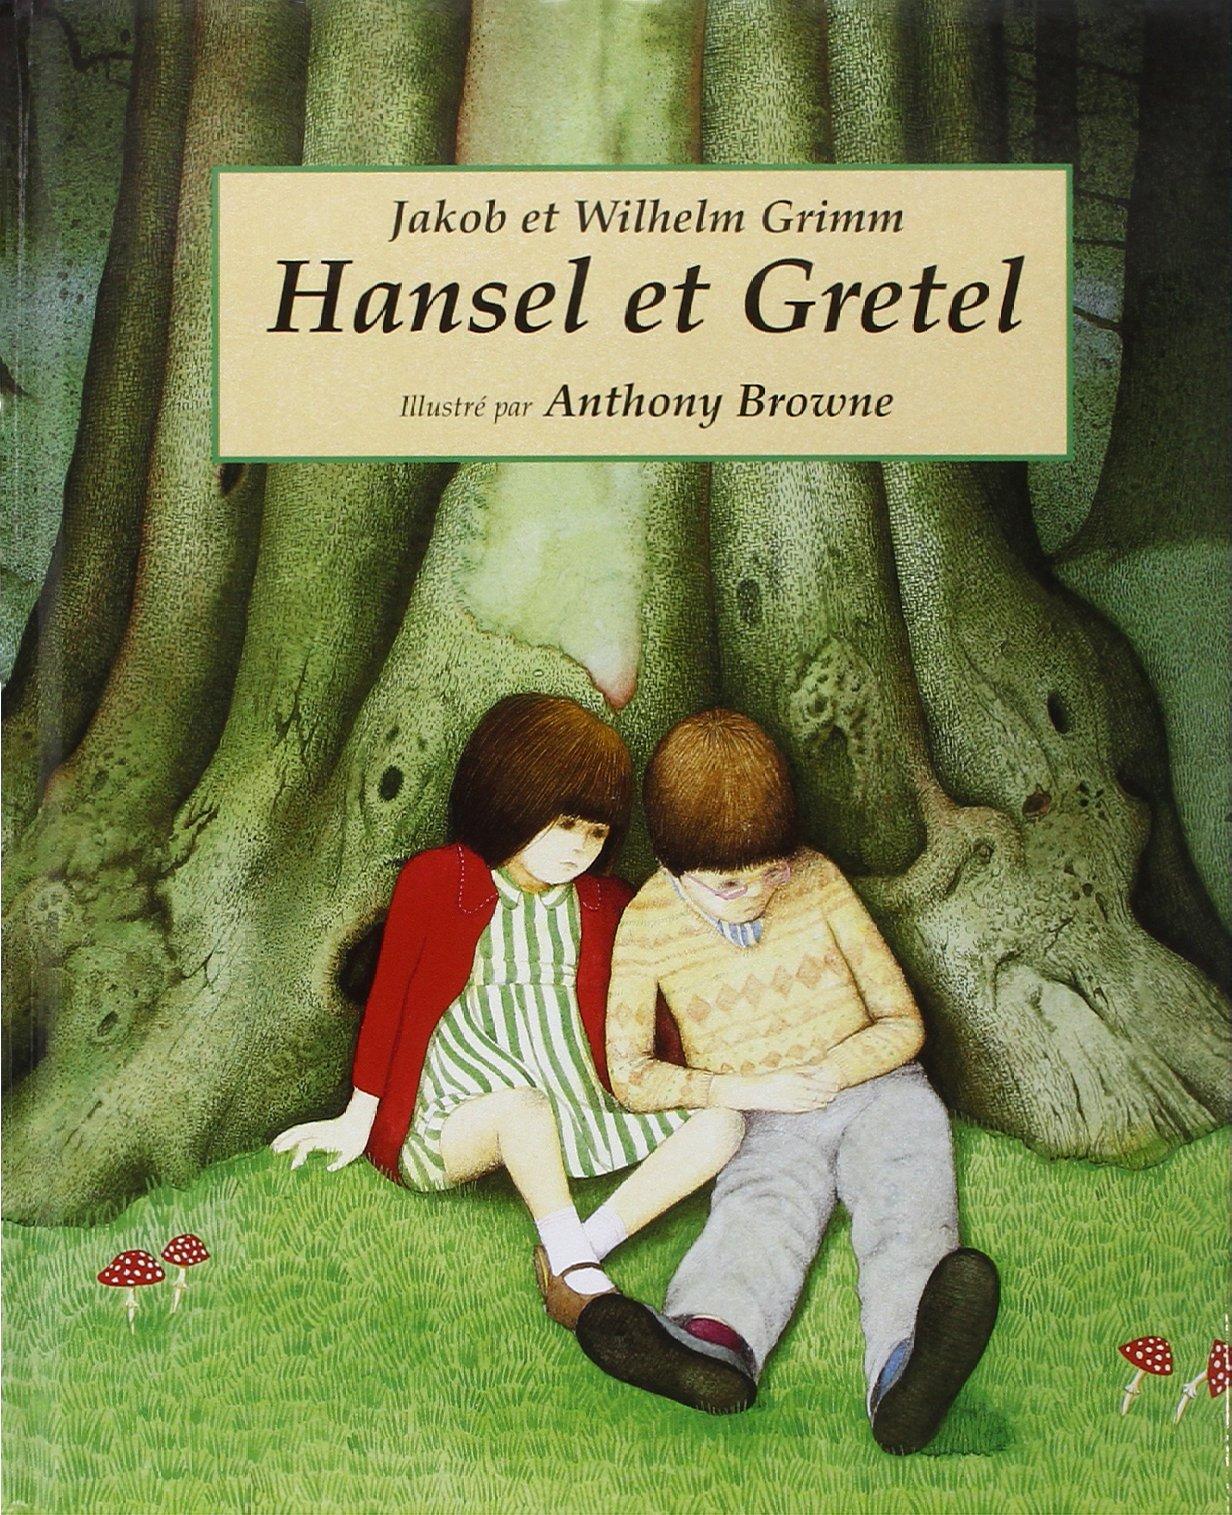 Hansel et gretel PDF